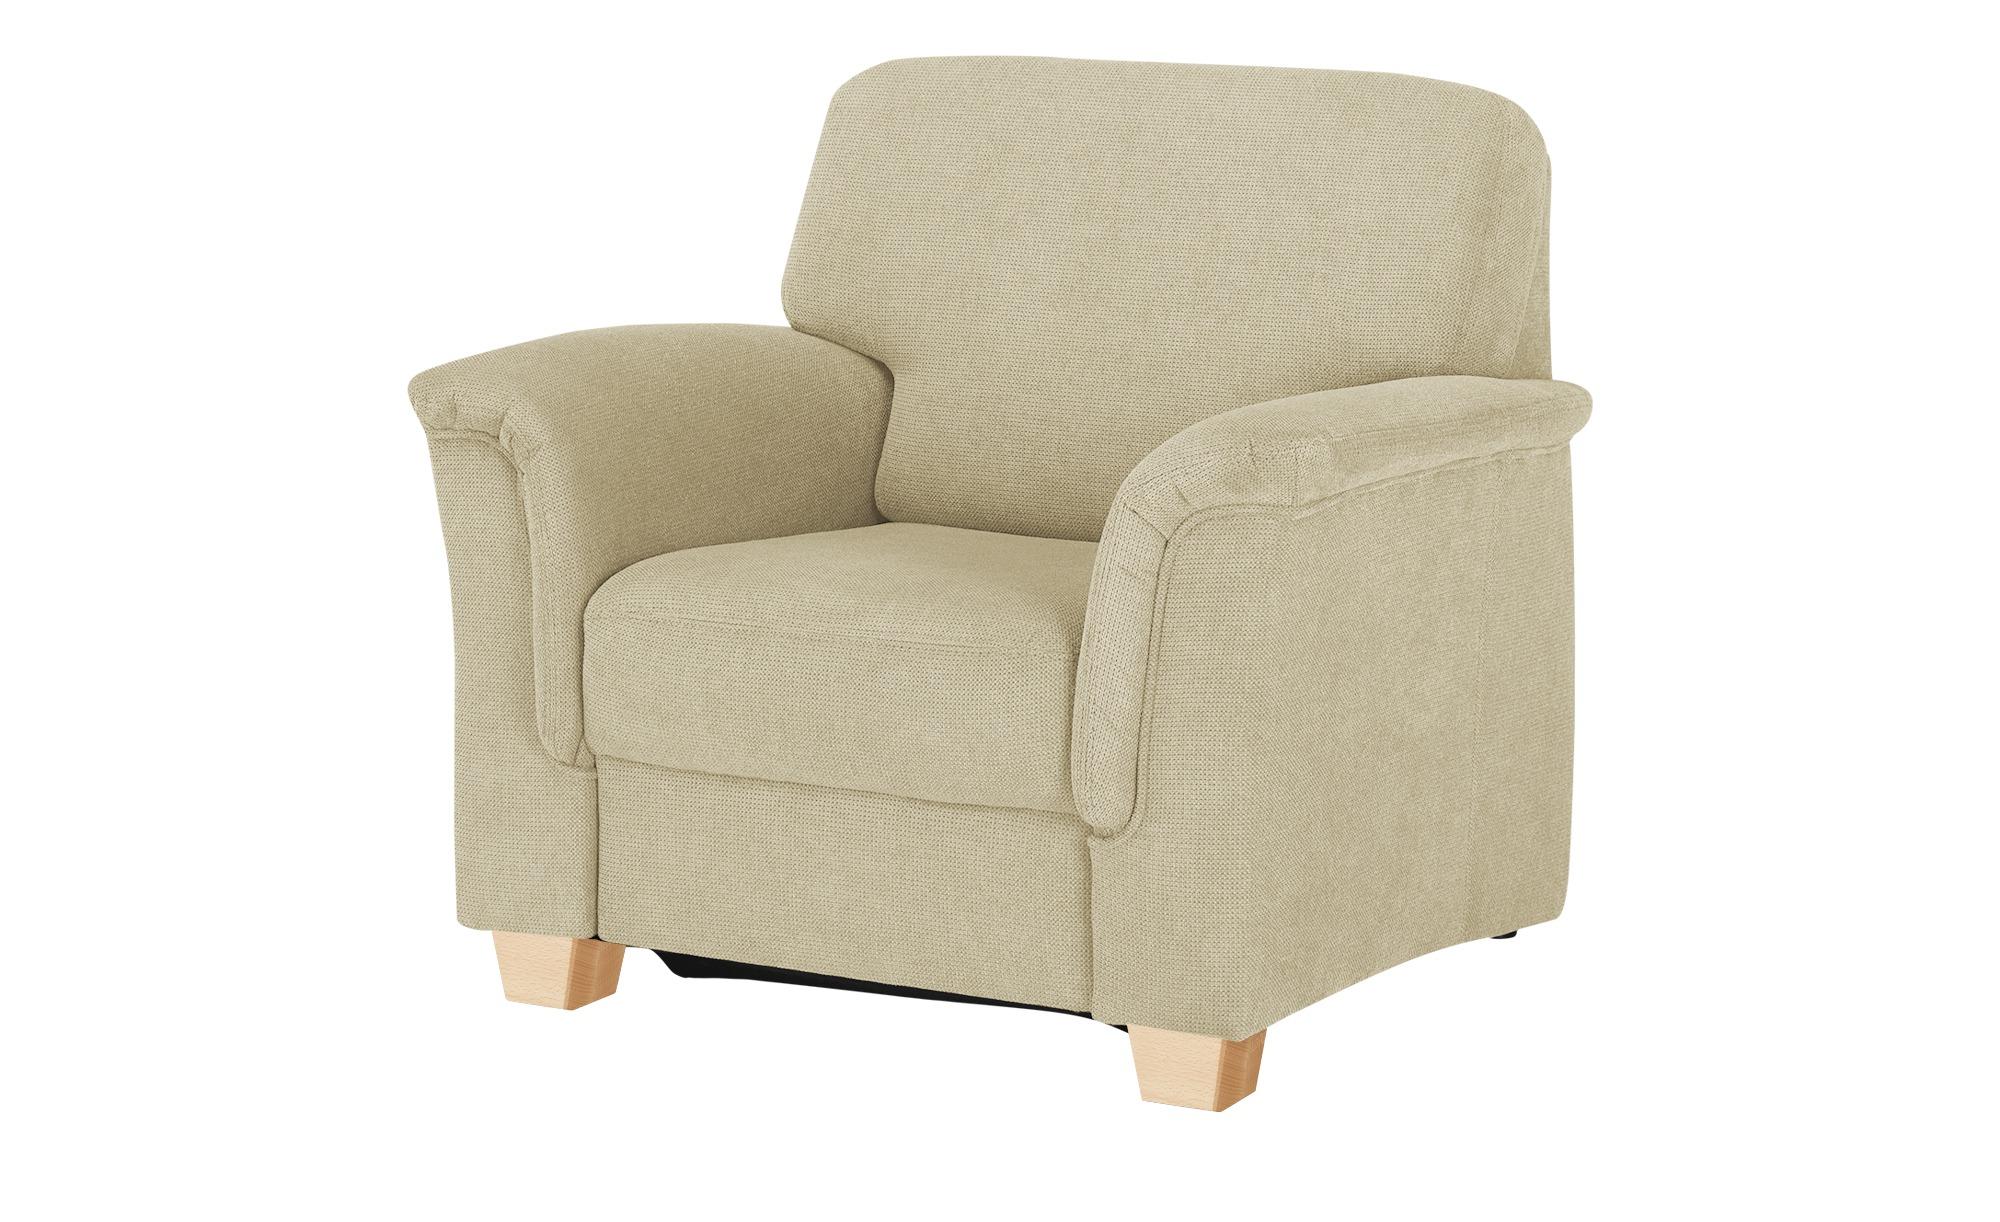 smart Sessel  Valencia ¦ creme ¦ Maße (cm): B: 100 H: 90 T: 93 Polstermöbel > Sessel > Polstersessel - Höffner